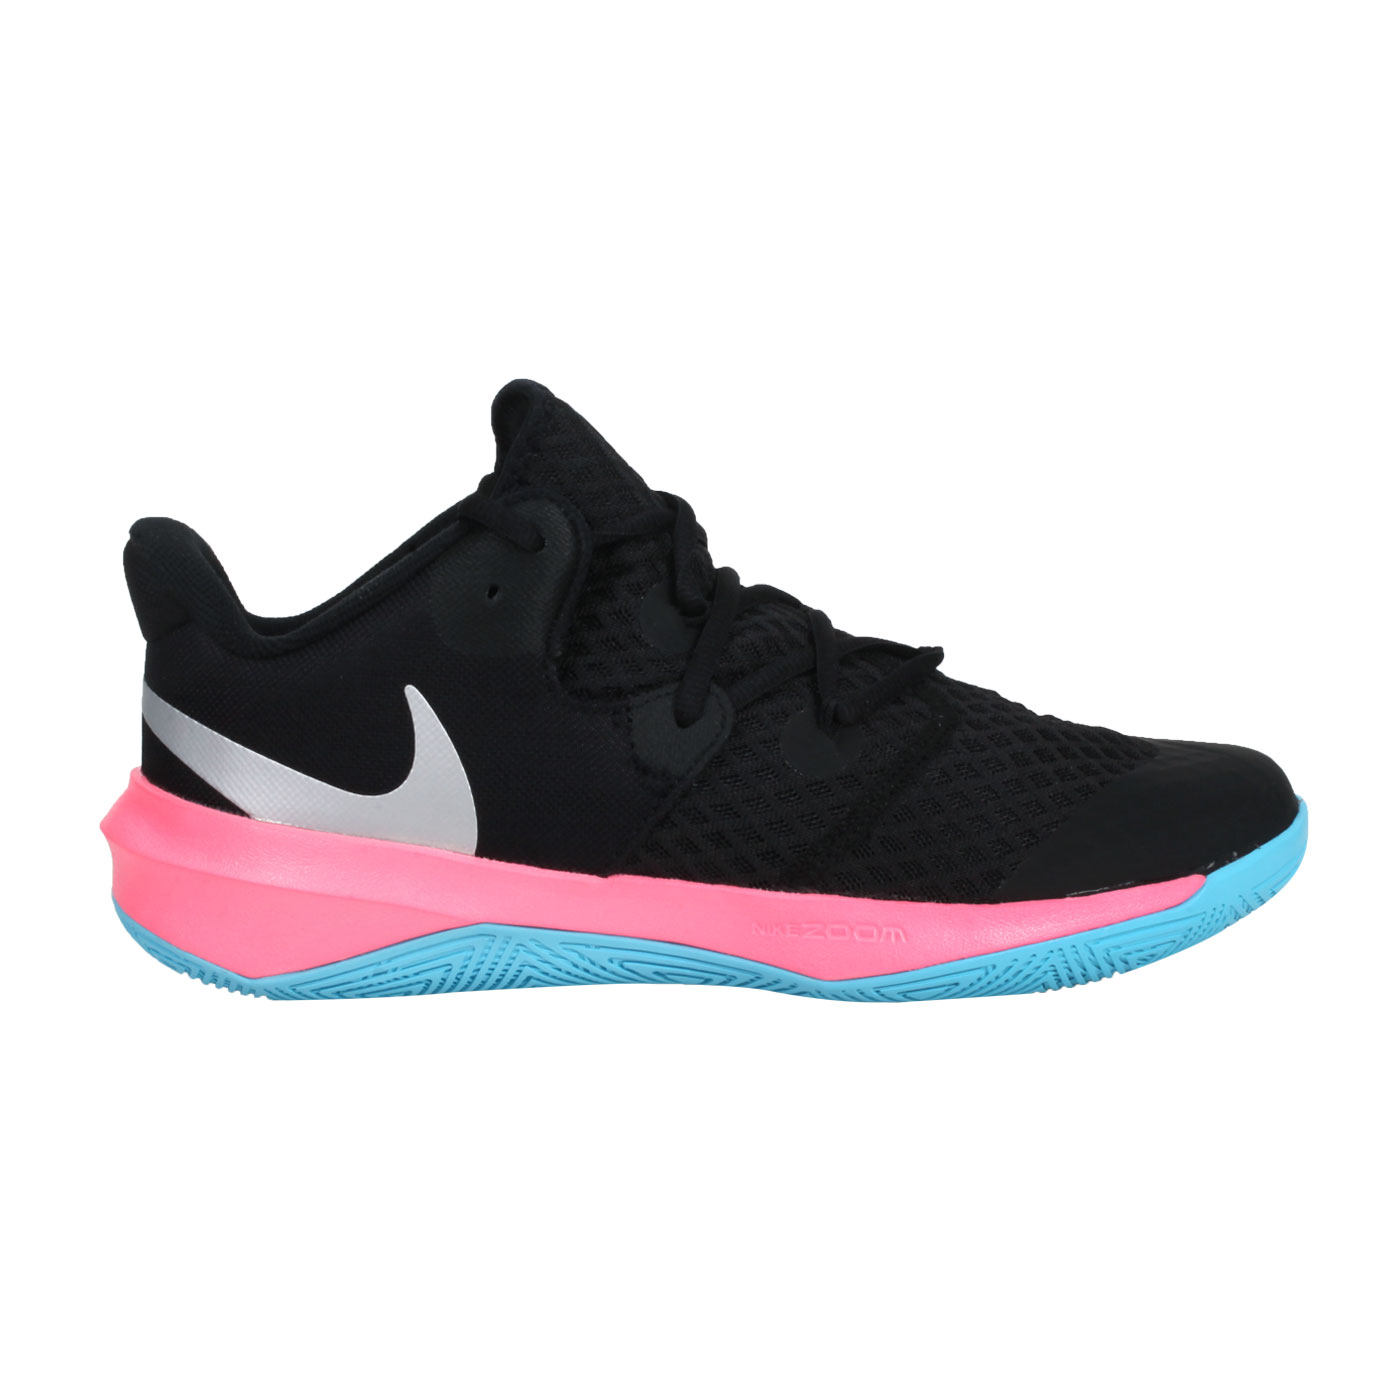 NIKE 排球鞋  @ZOOM HYPERSPEED COURT SE@DJ4476064 - 黑銀粉紅藍